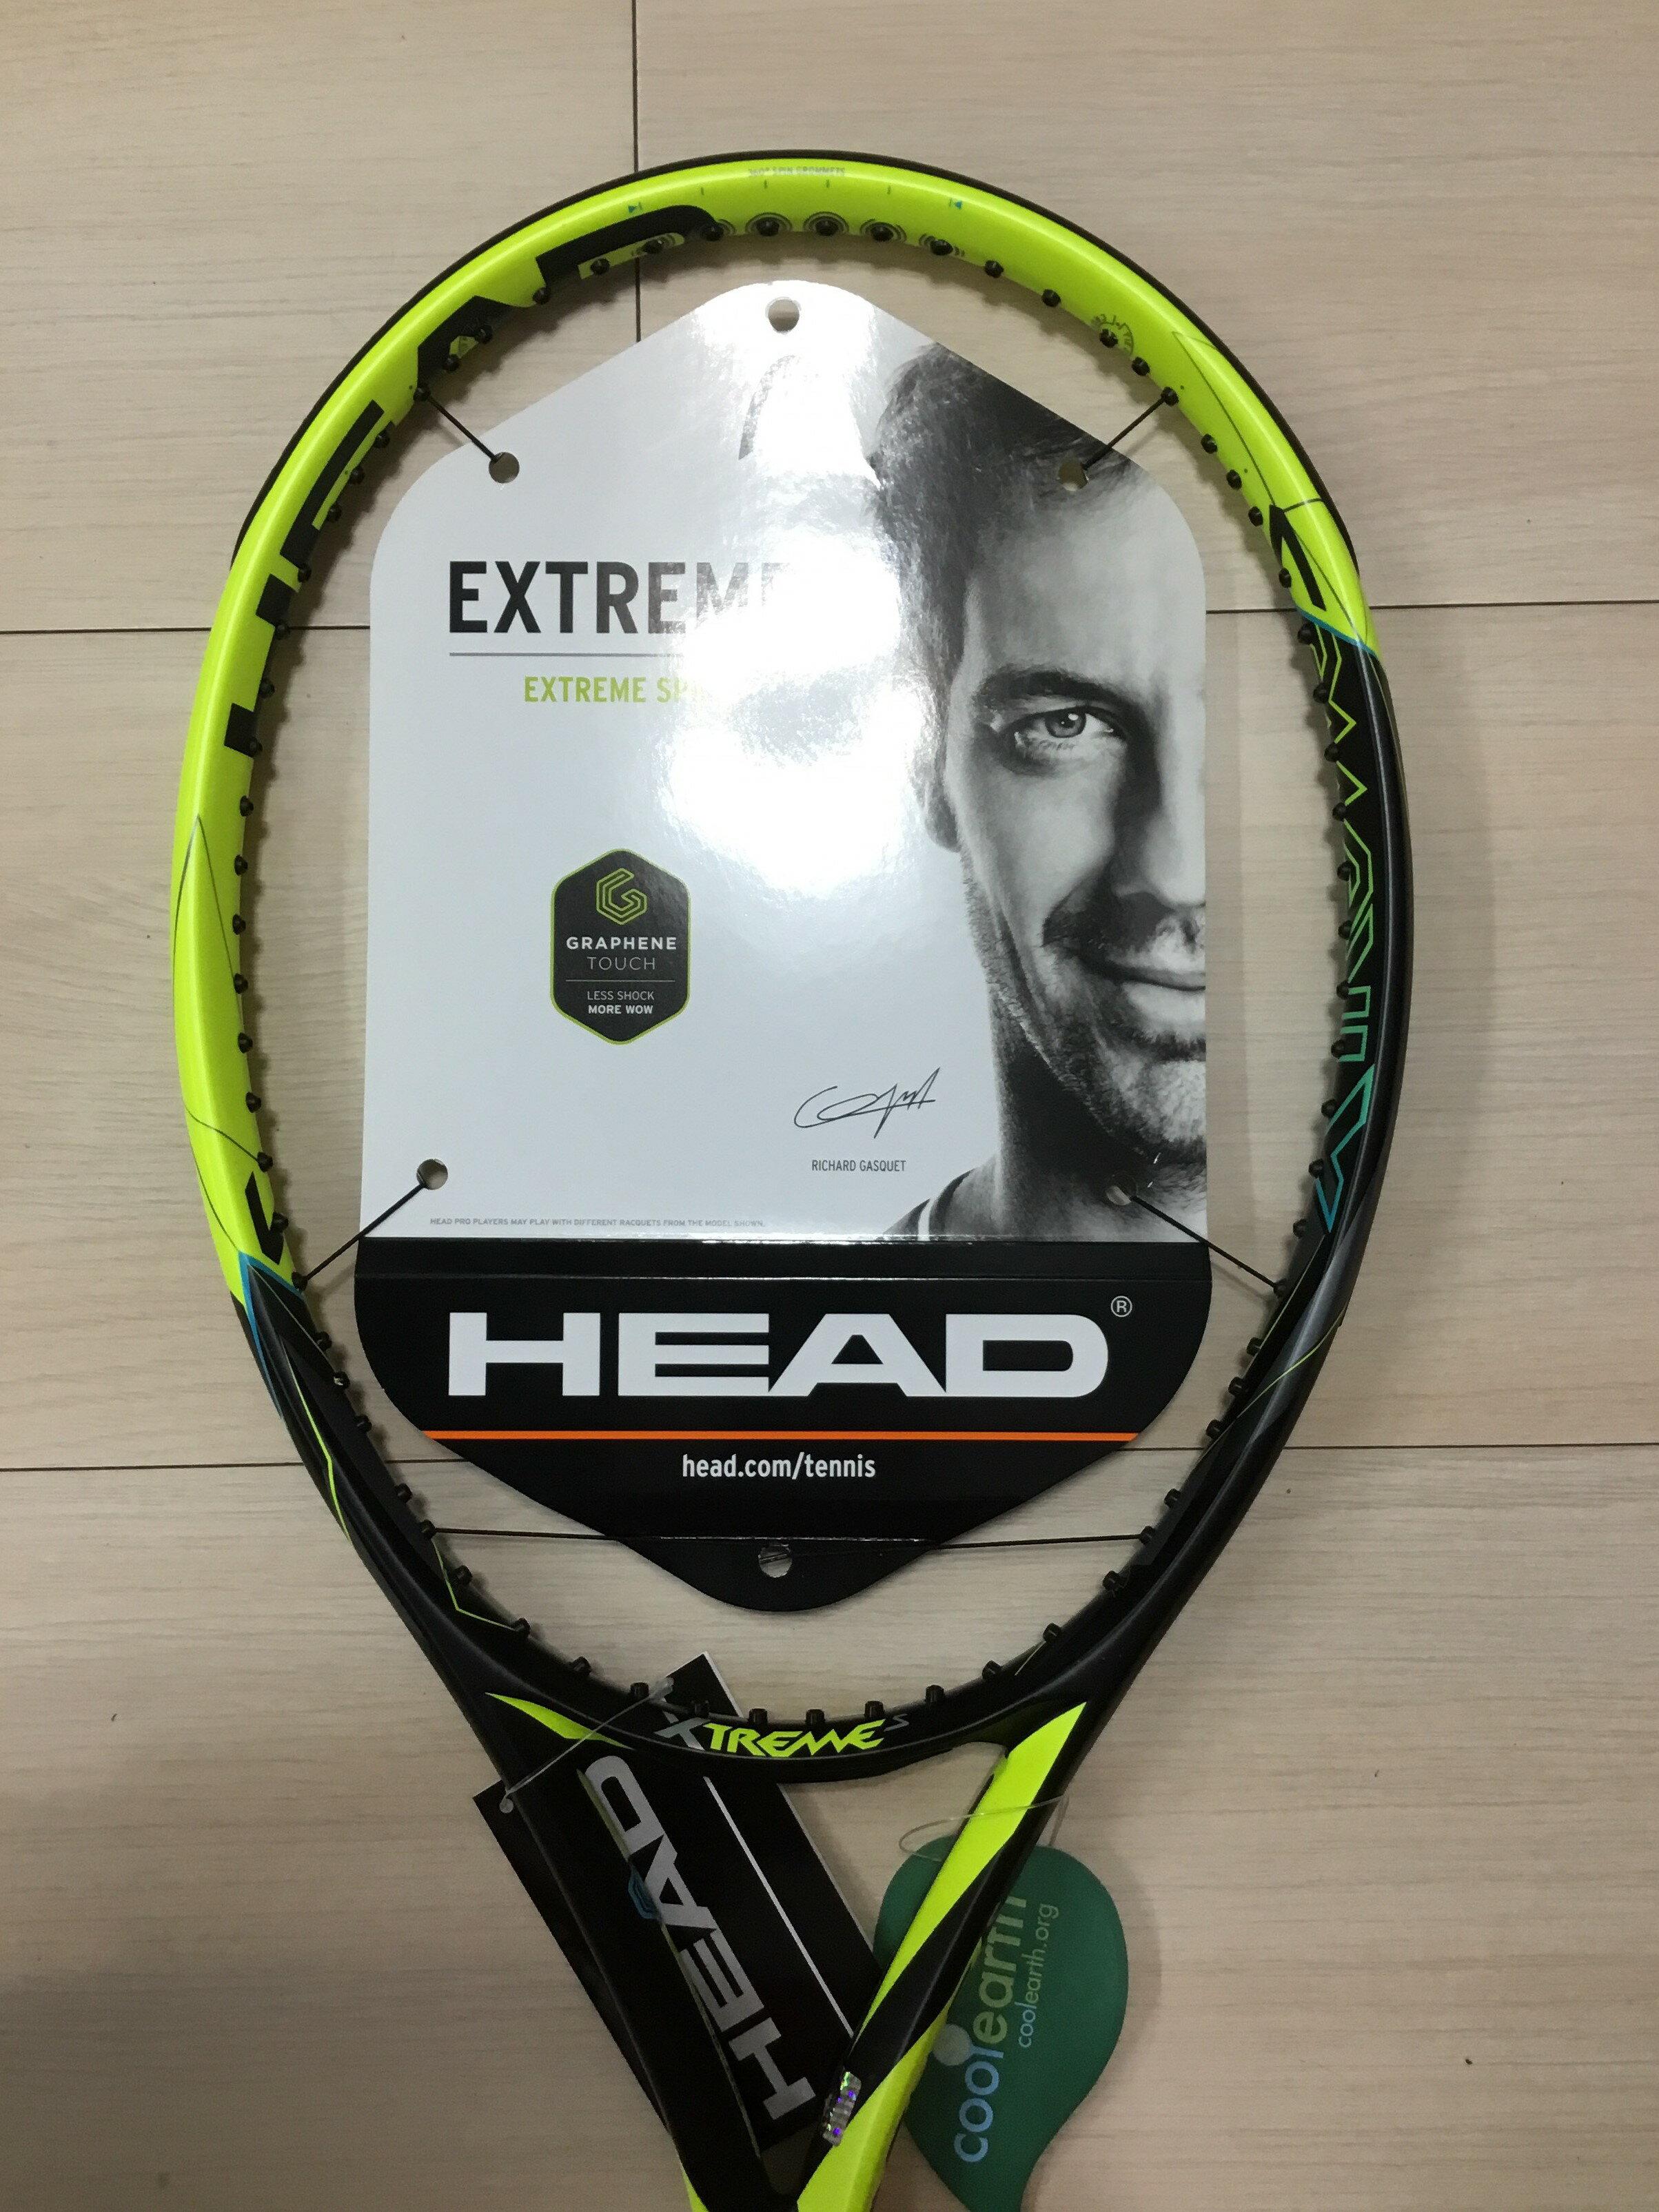 2017 Head Graphene Touch Extreme S 專業網球拍